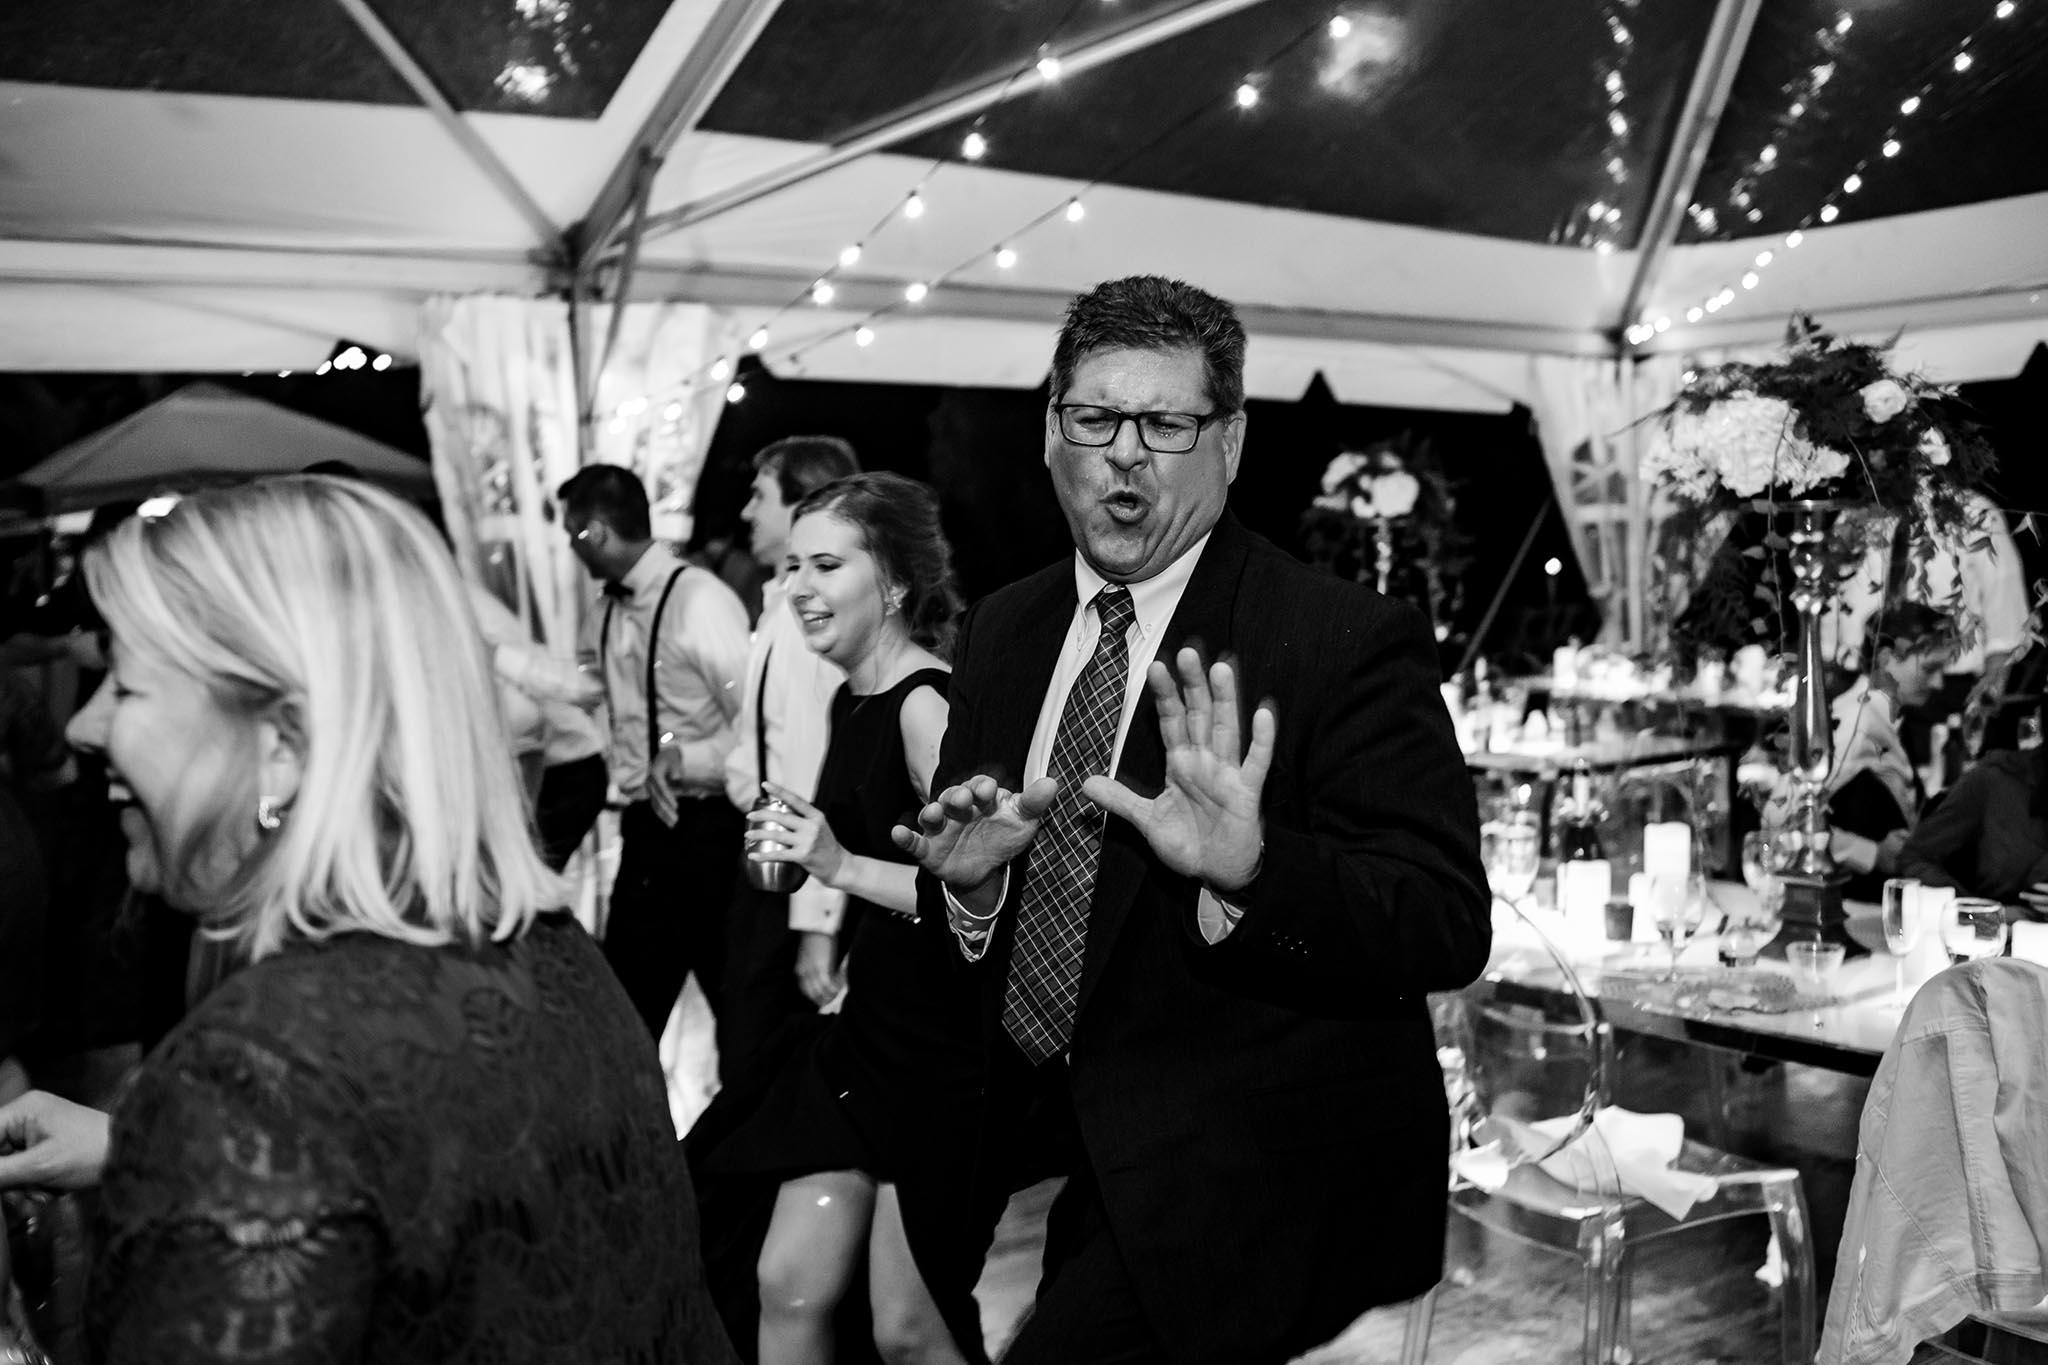 dancing on dance flor at wedding